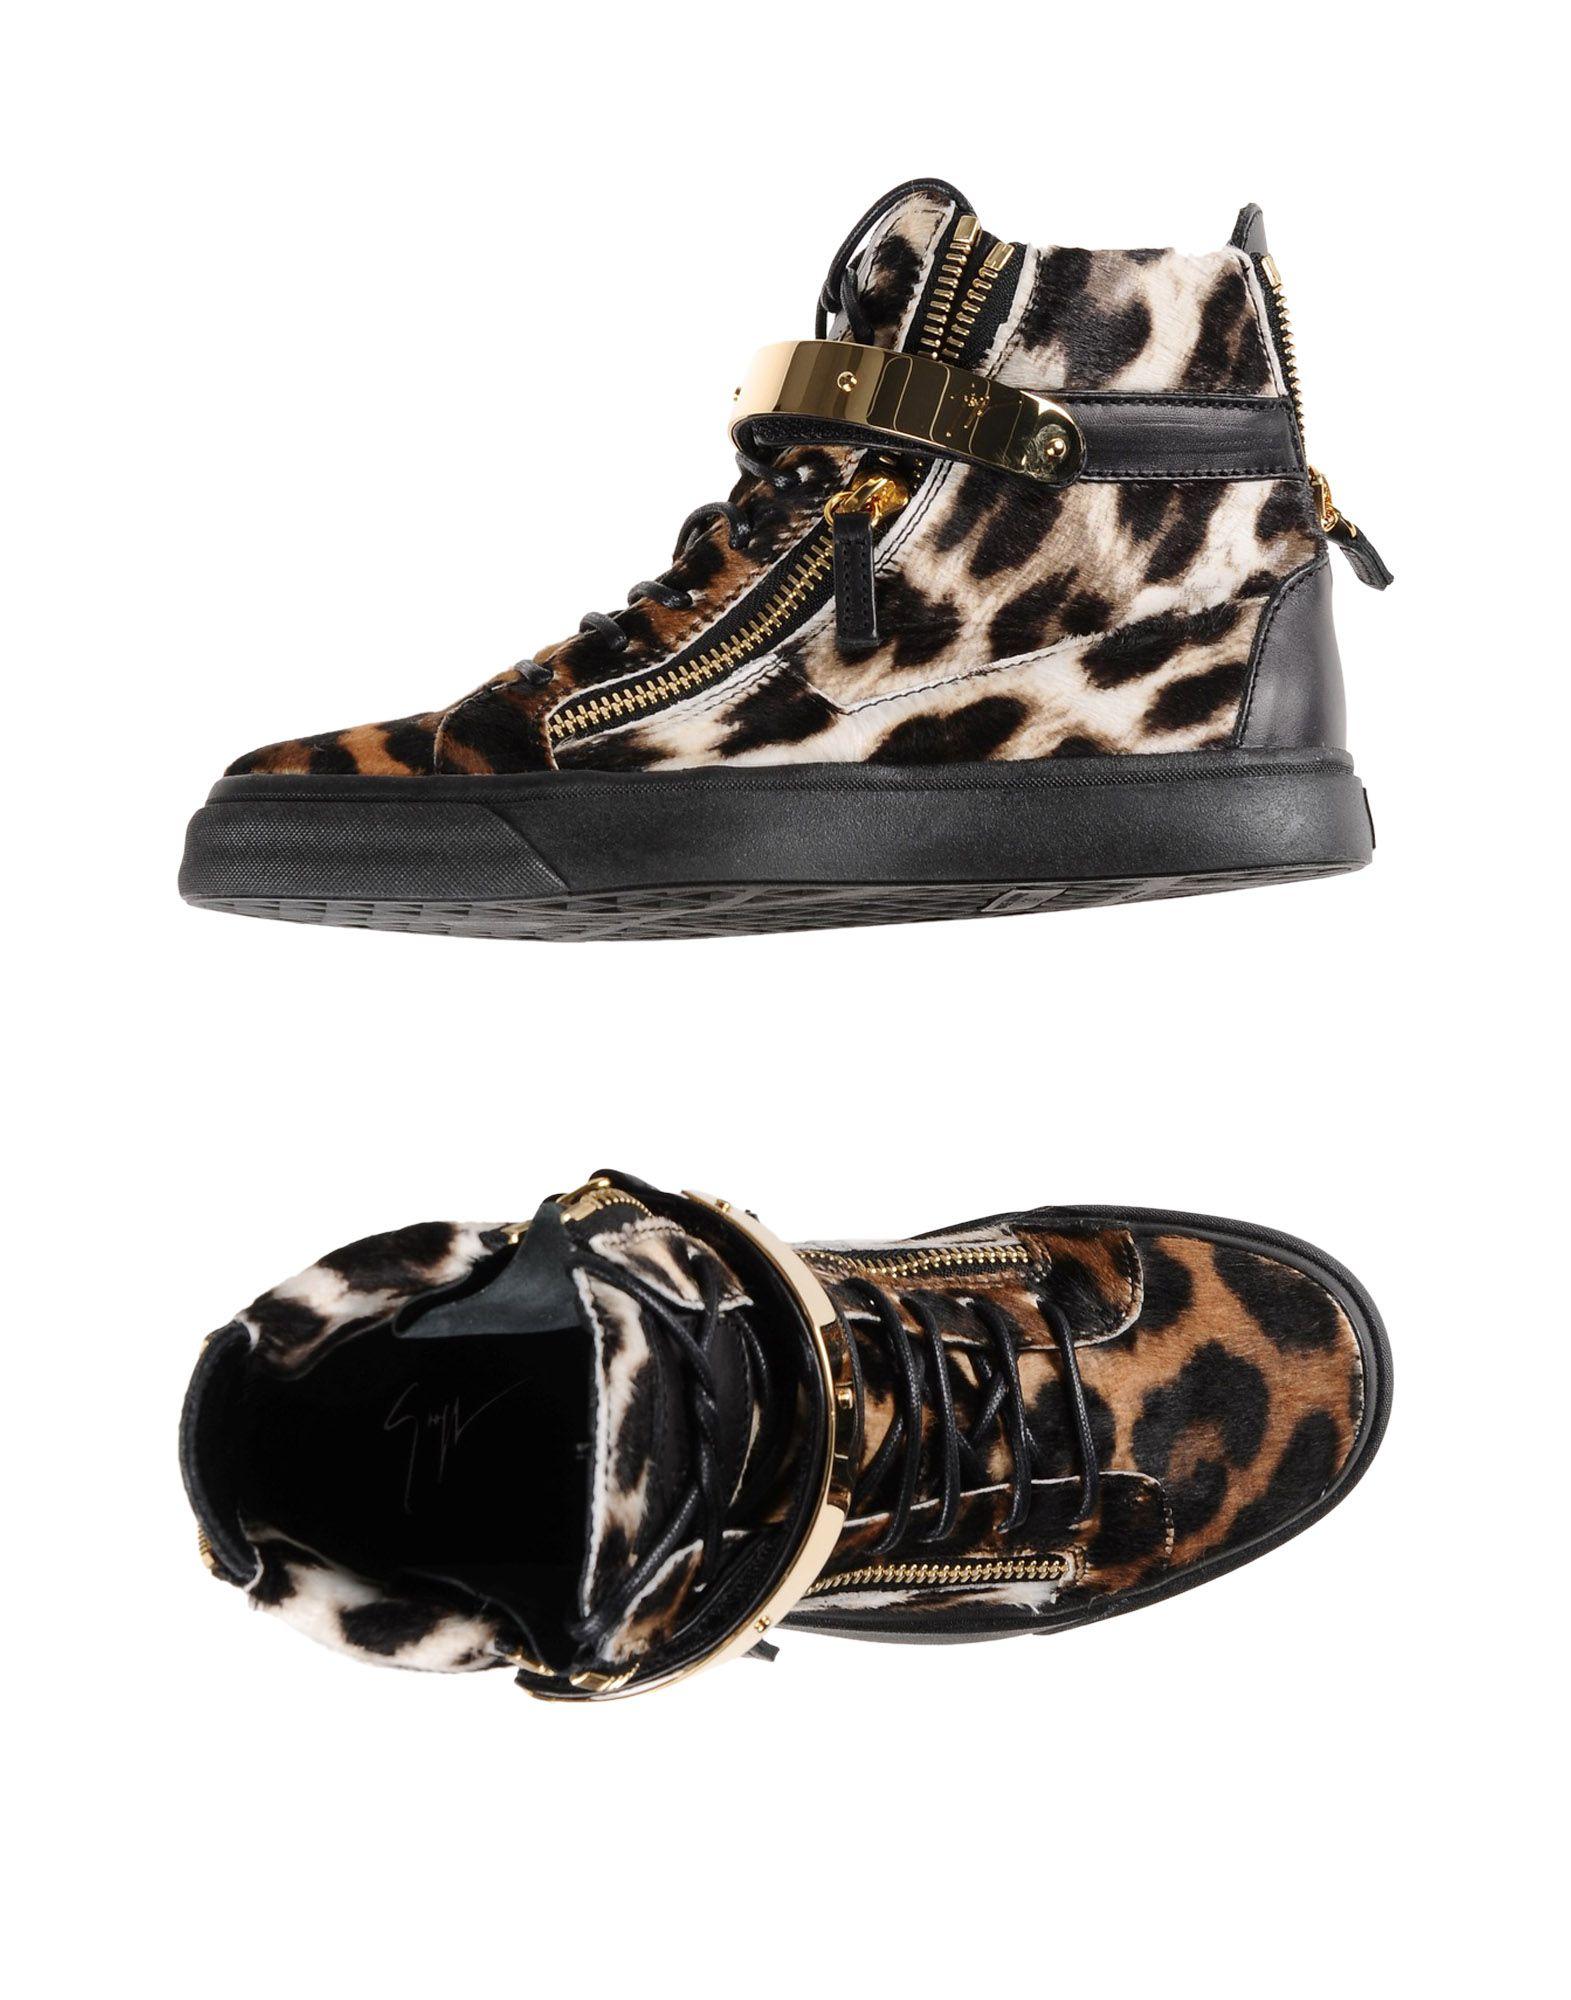 Giuseppe Damen Zanotti Sneakers Damen Giuseppe  11259625MU Neue Schuhe 2361de